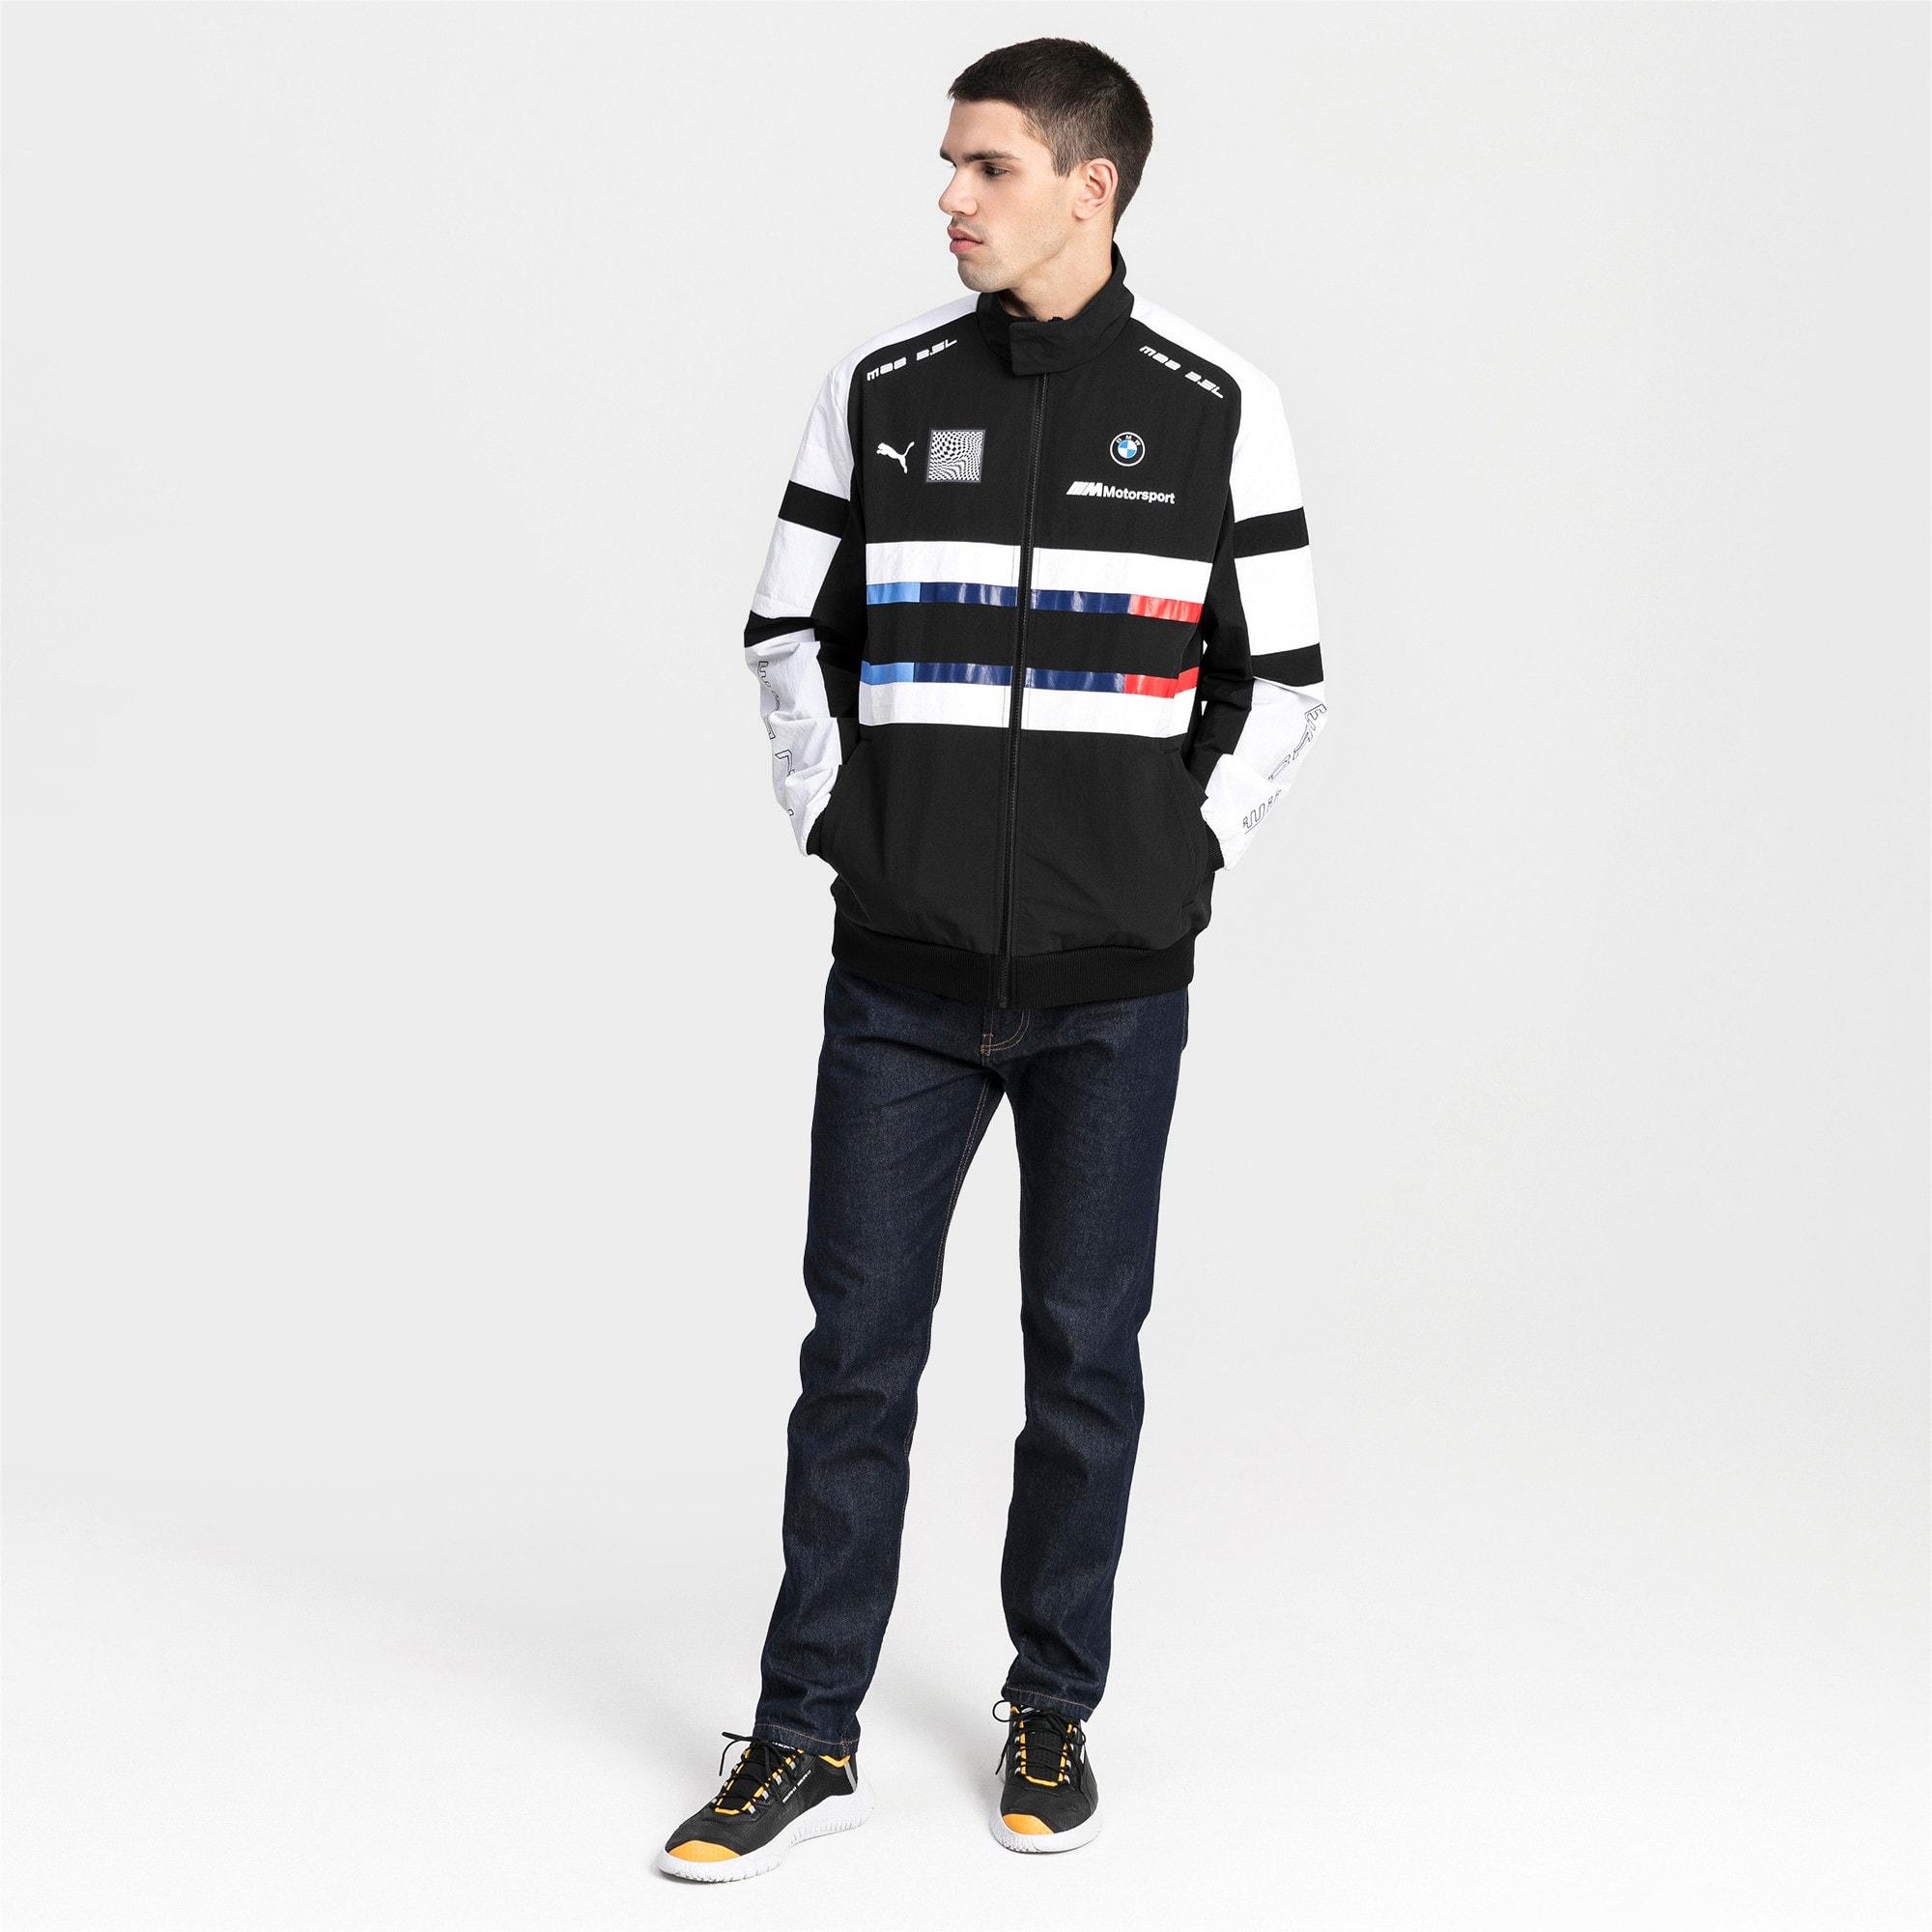 Thumbnail 3 of BMW Motorsport Street Woven Men's Jacket, Puma Black, medium